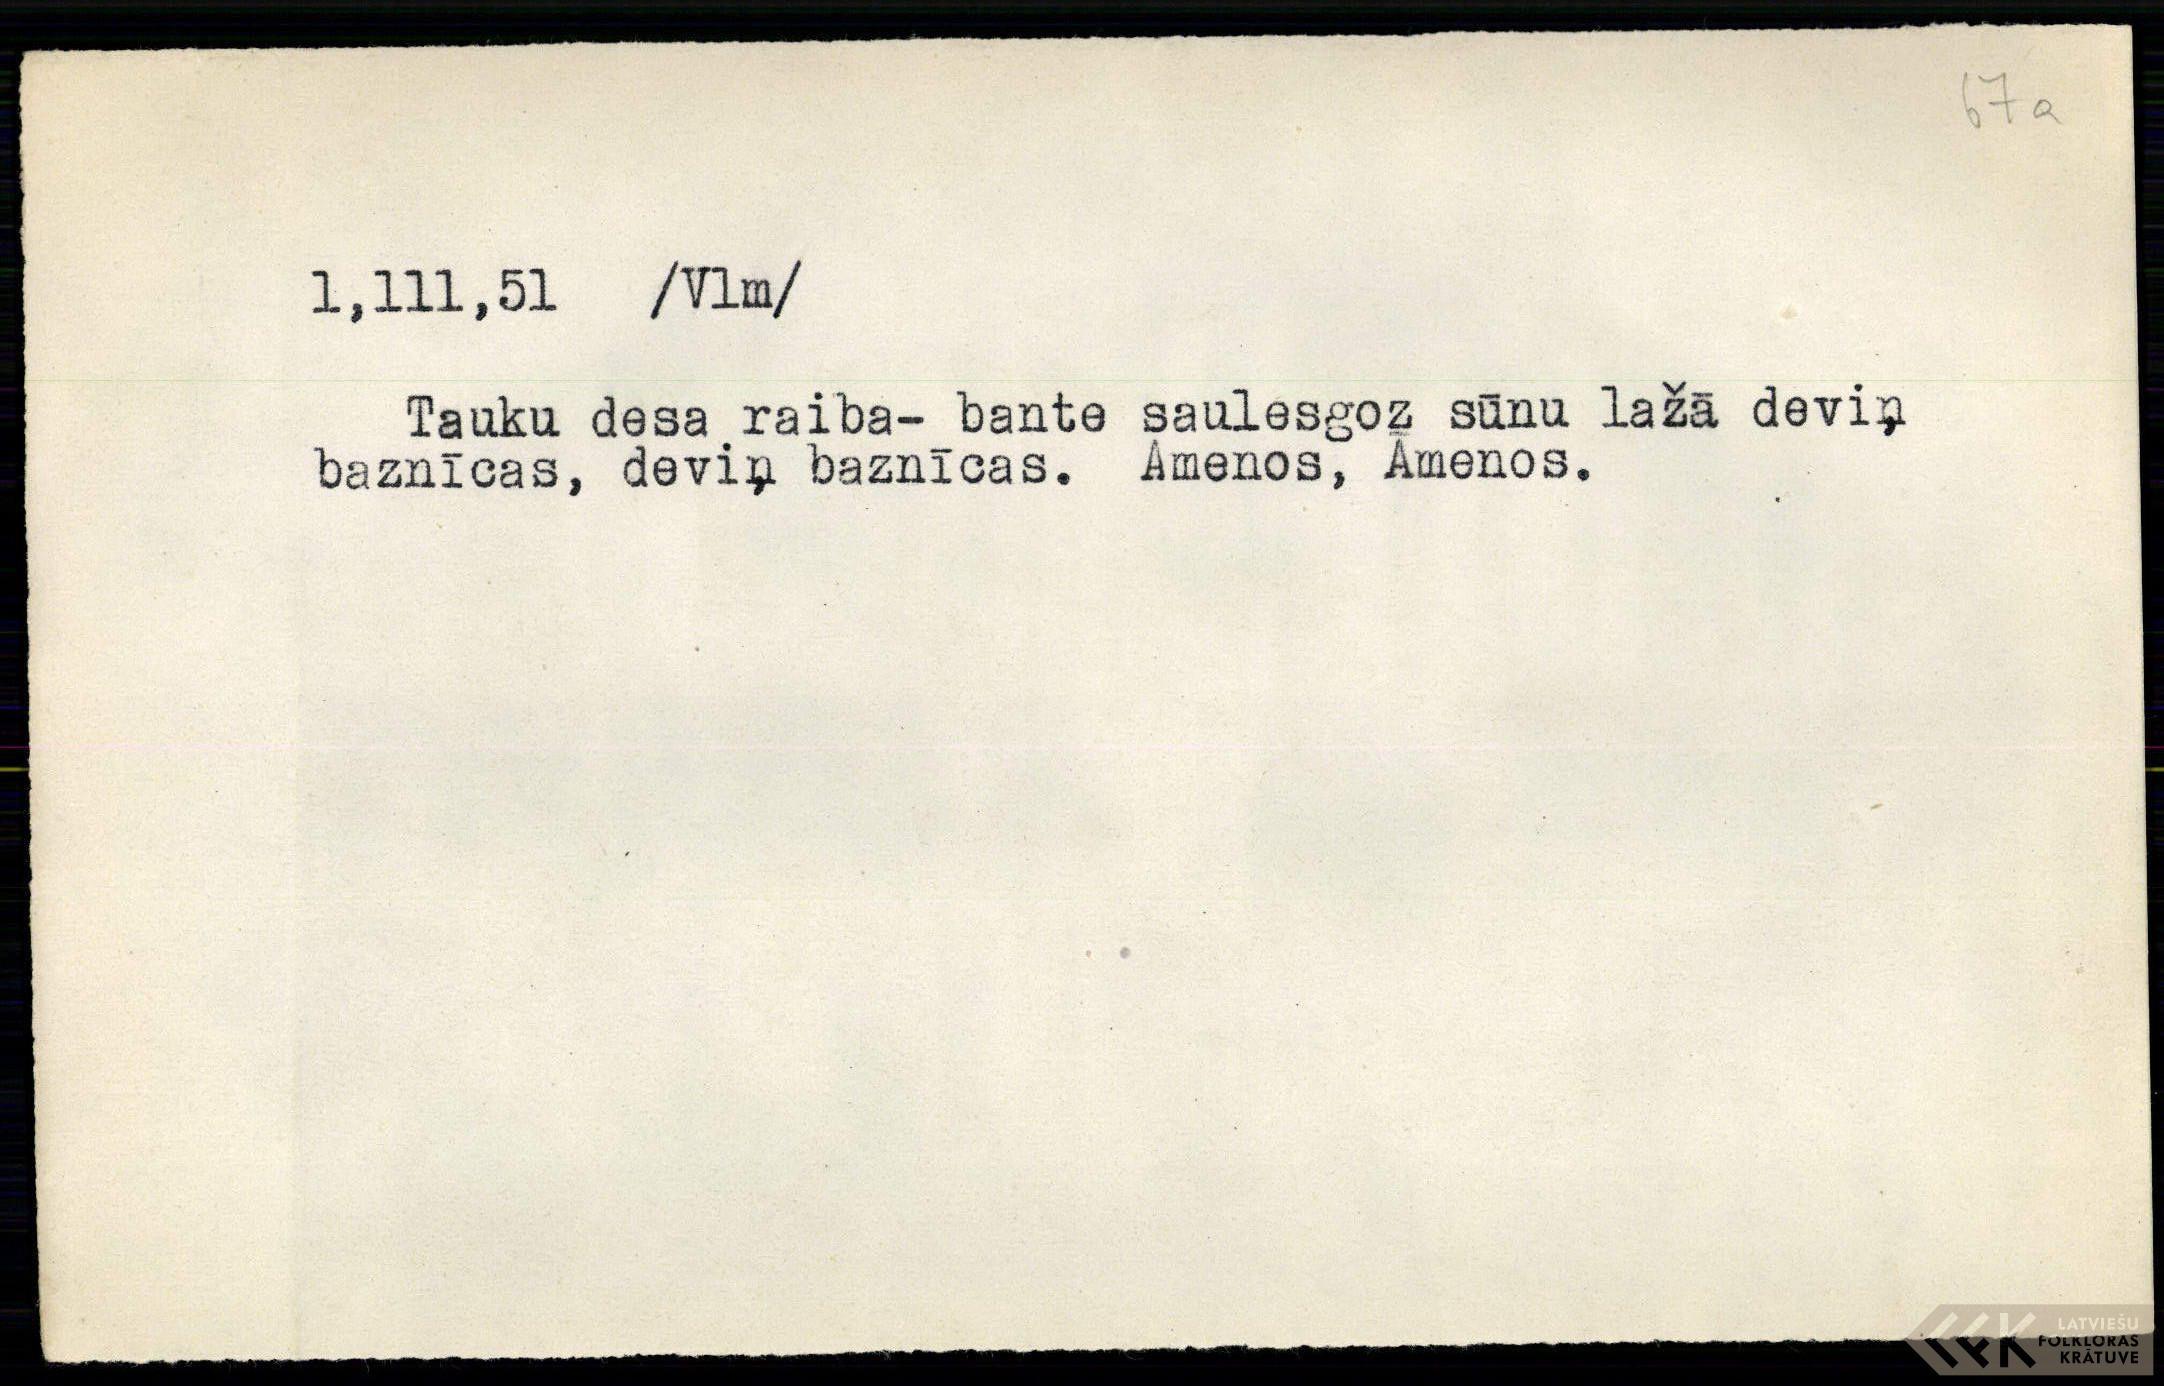 LFK-0001-0111-00051-buramvardu-kartoteka